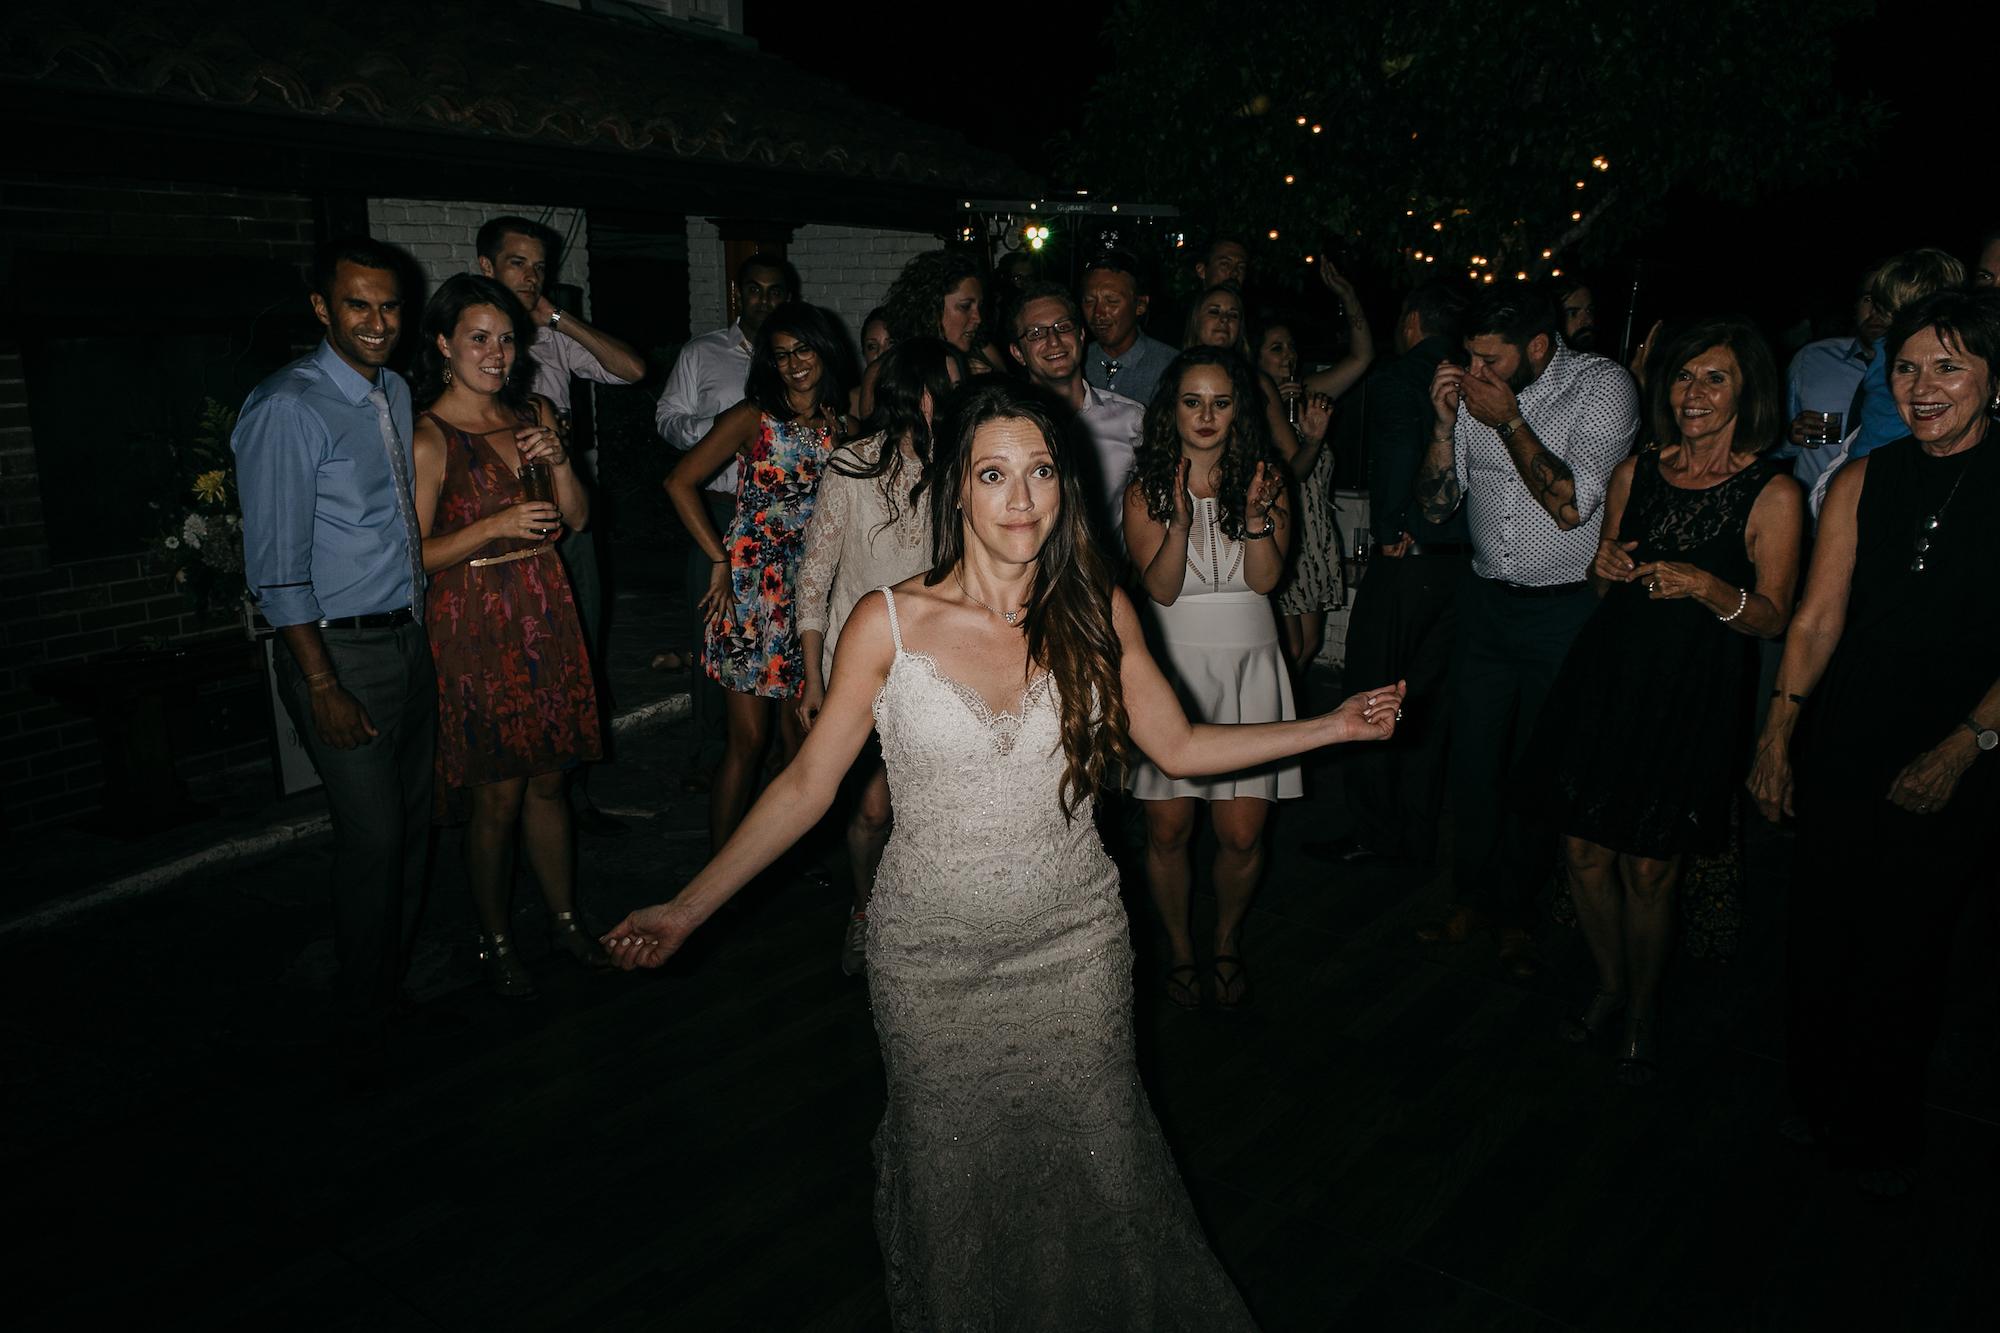 anvil-vineyards-wedding-photographer779.jpg